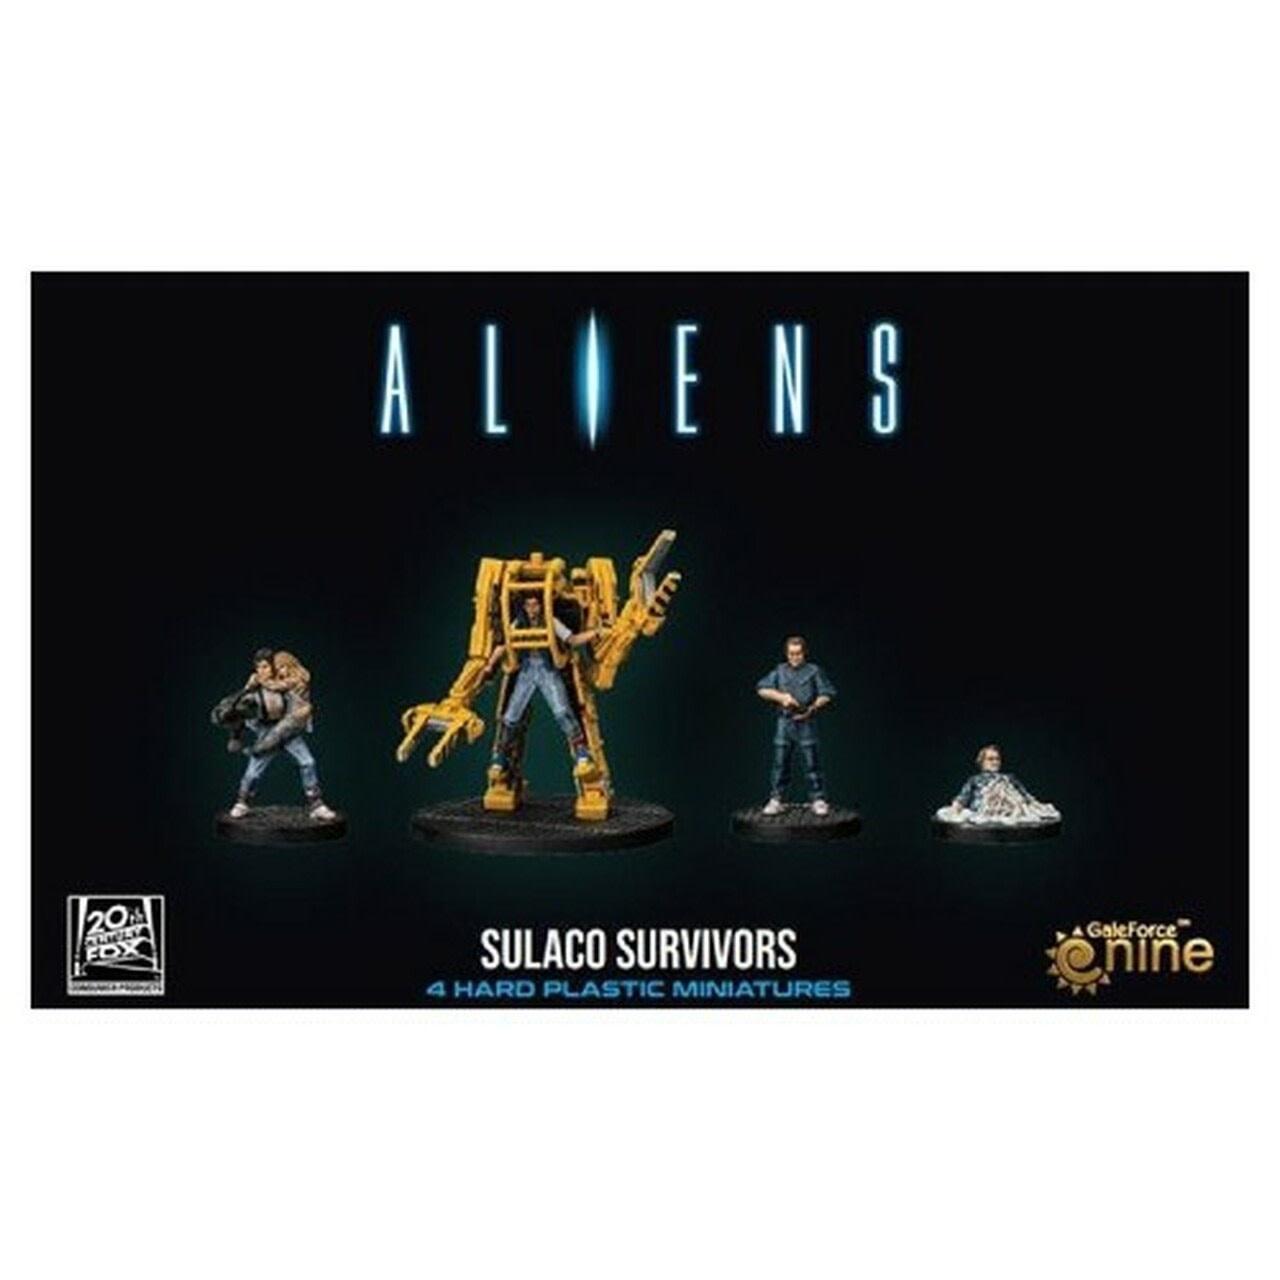 Gale Force Nine Aliens: Sulaco Survivors